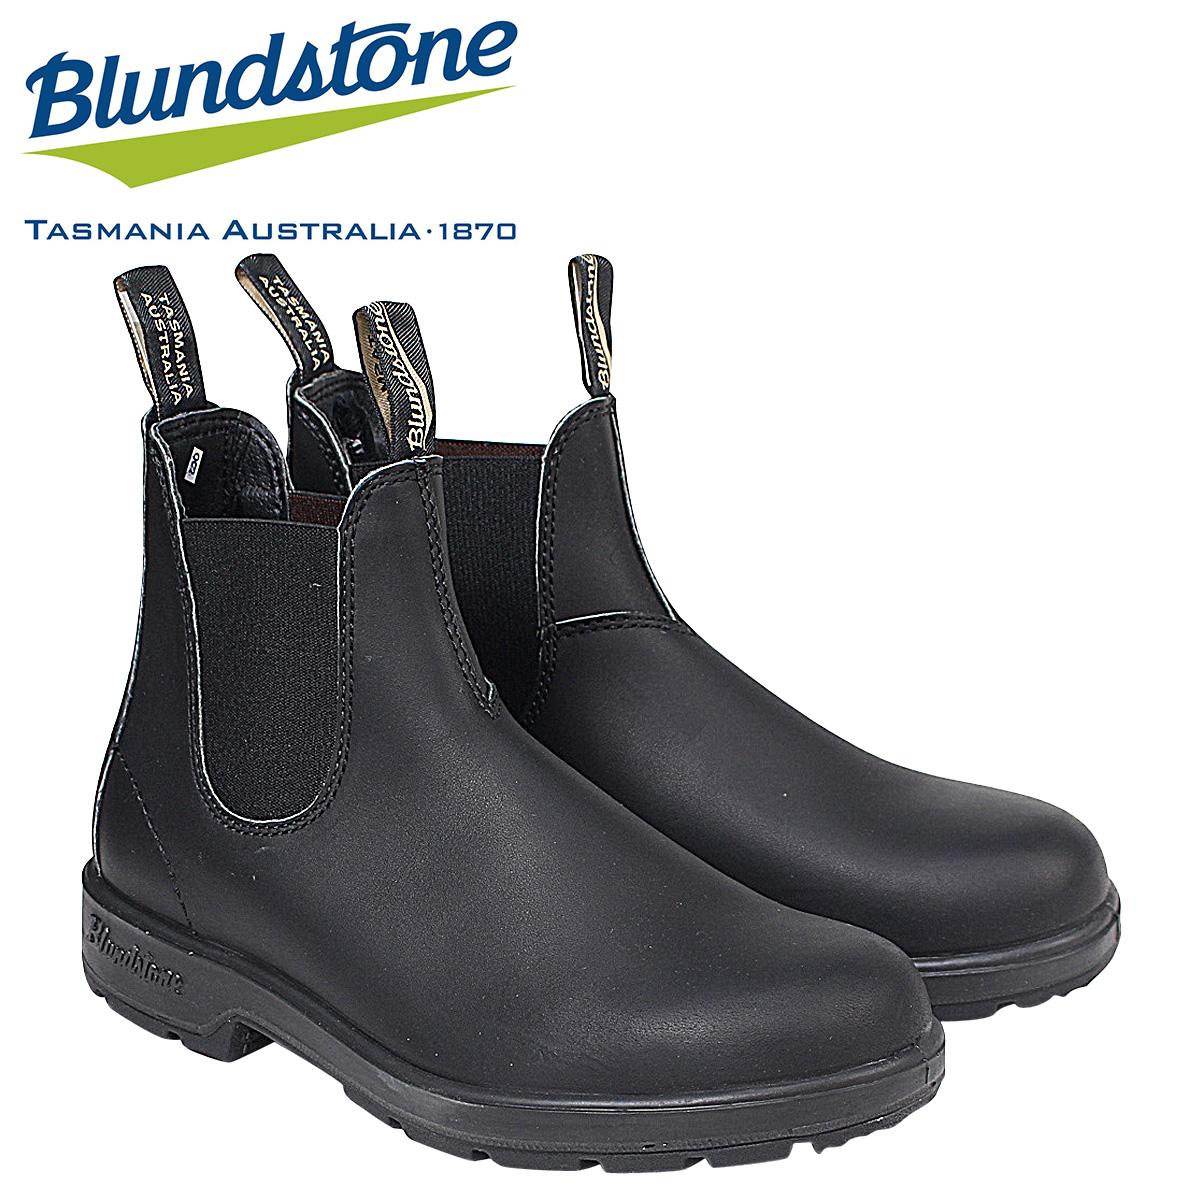 Blundstone ブランドストーン サイドゴア メンズ ブーツ CLASSICS 510 ブラック 黒